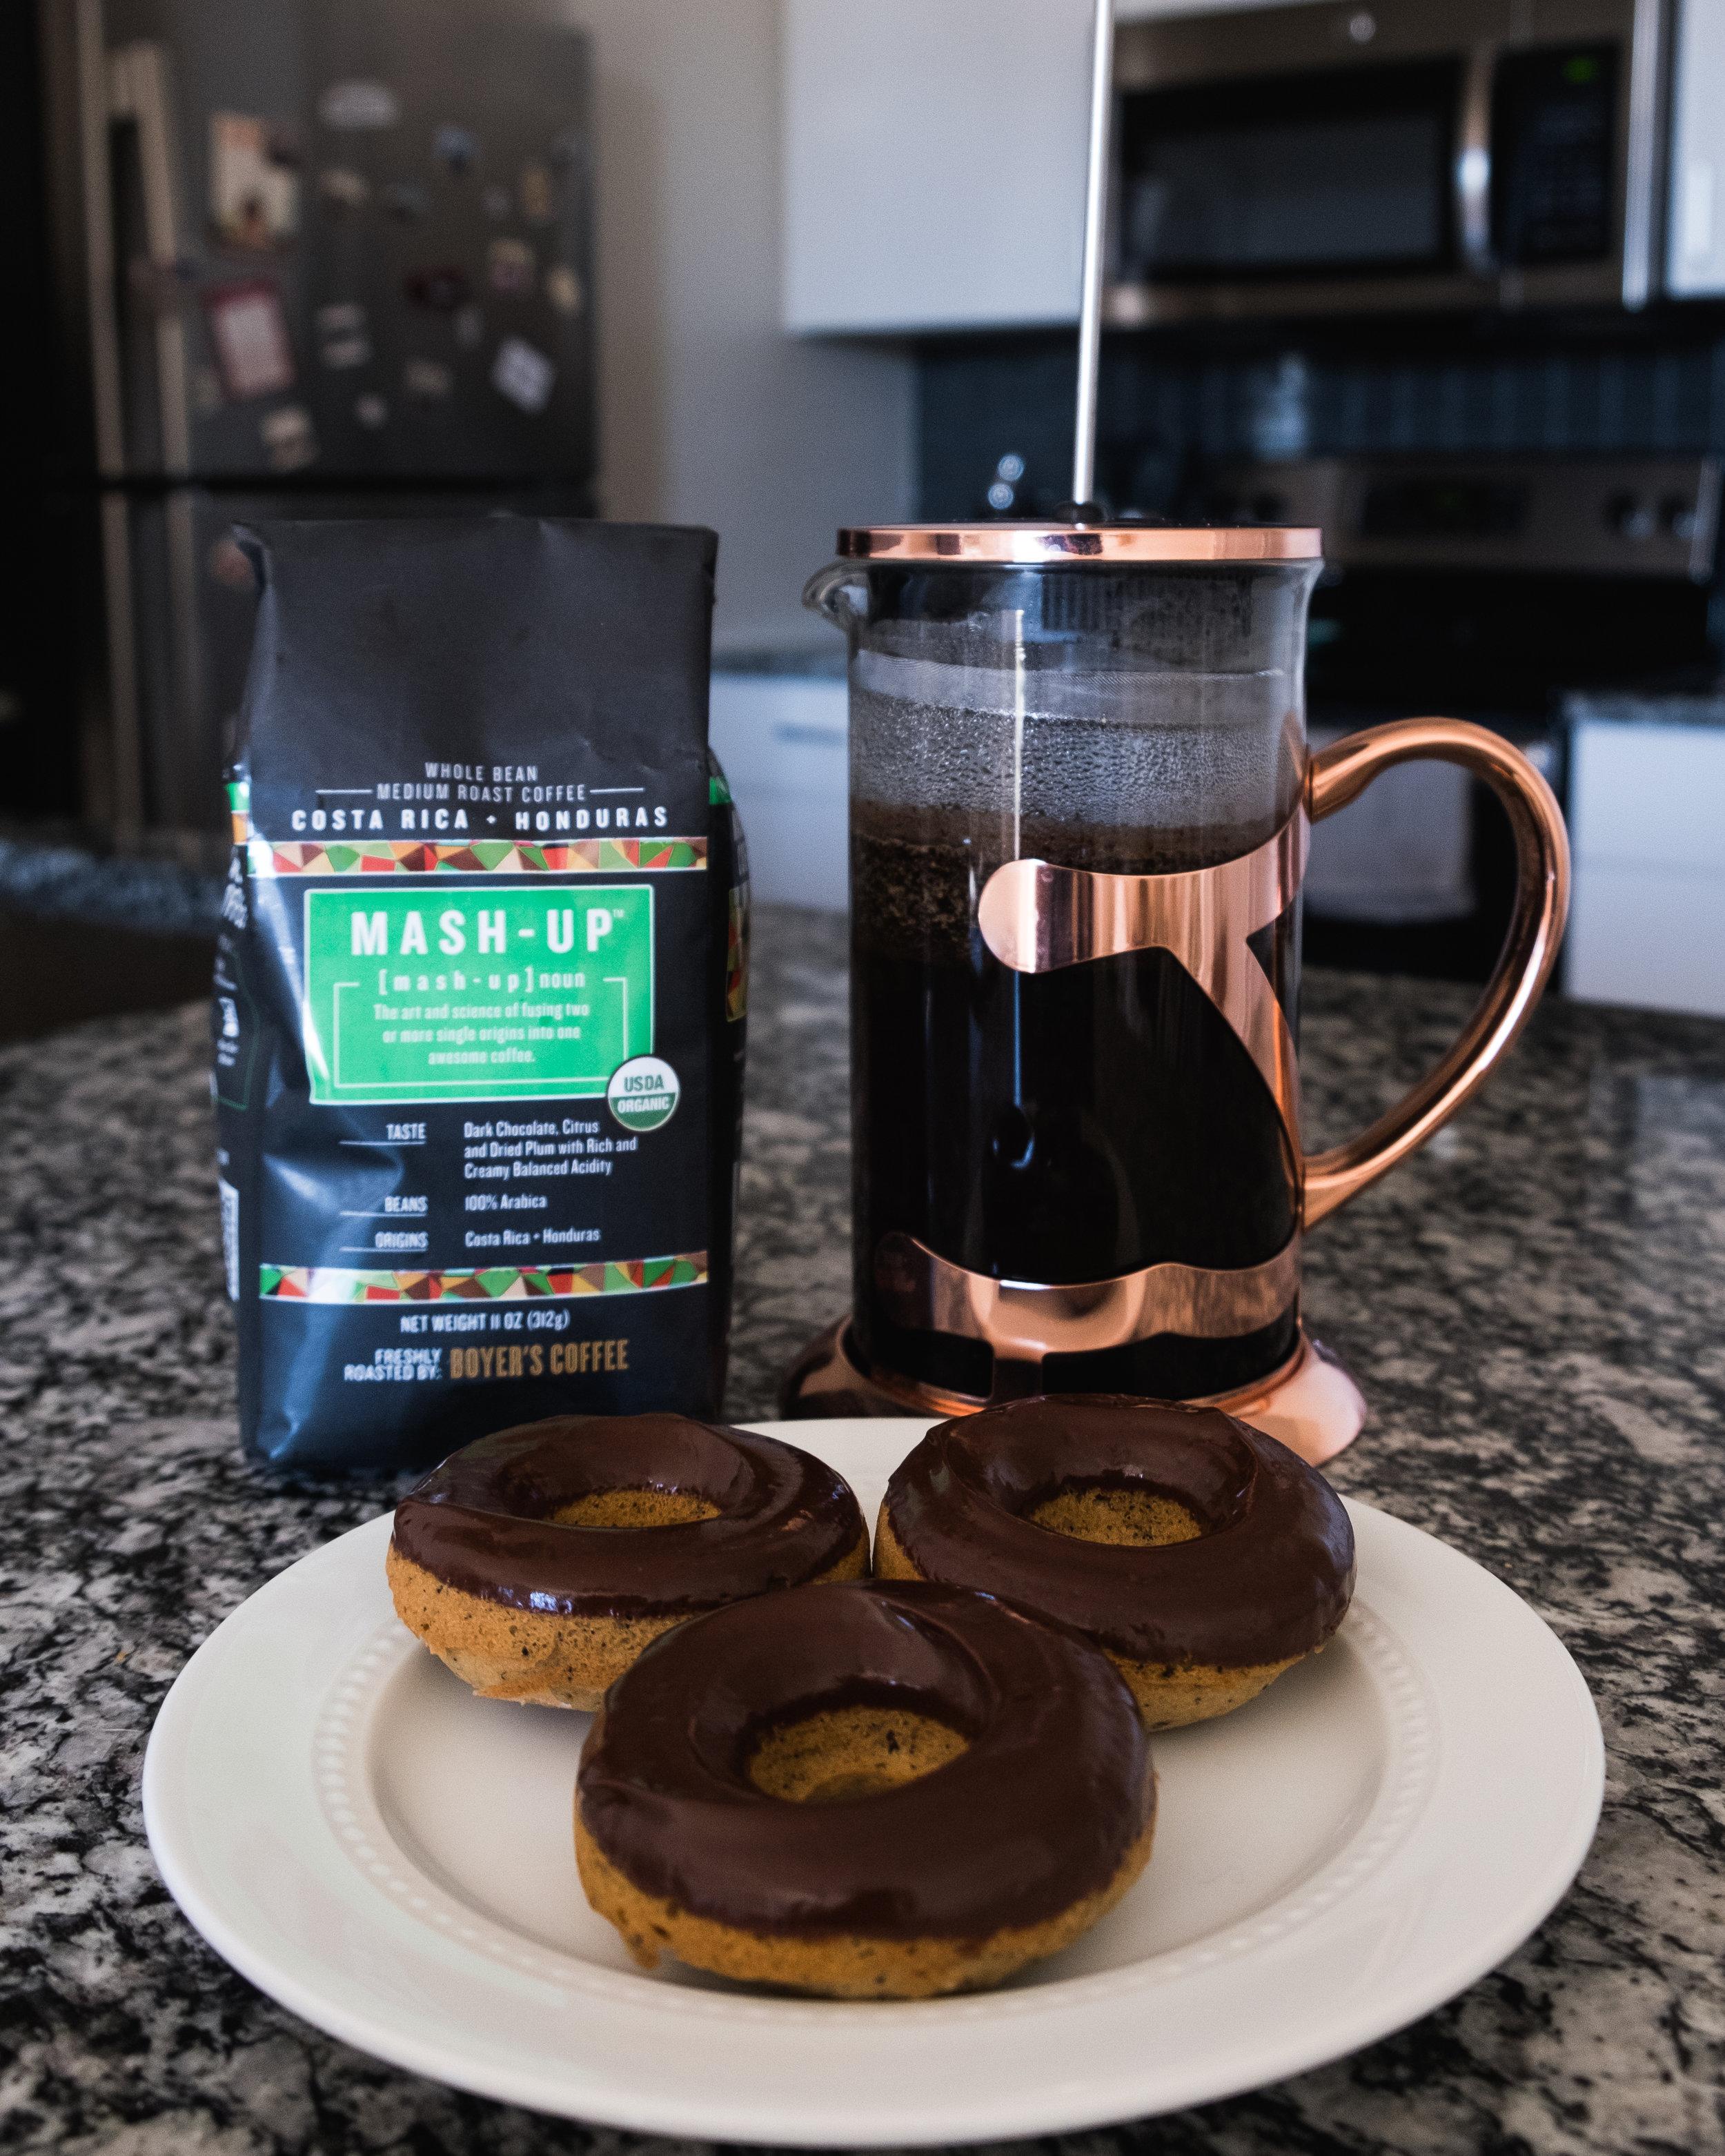 boyers coffee donuts